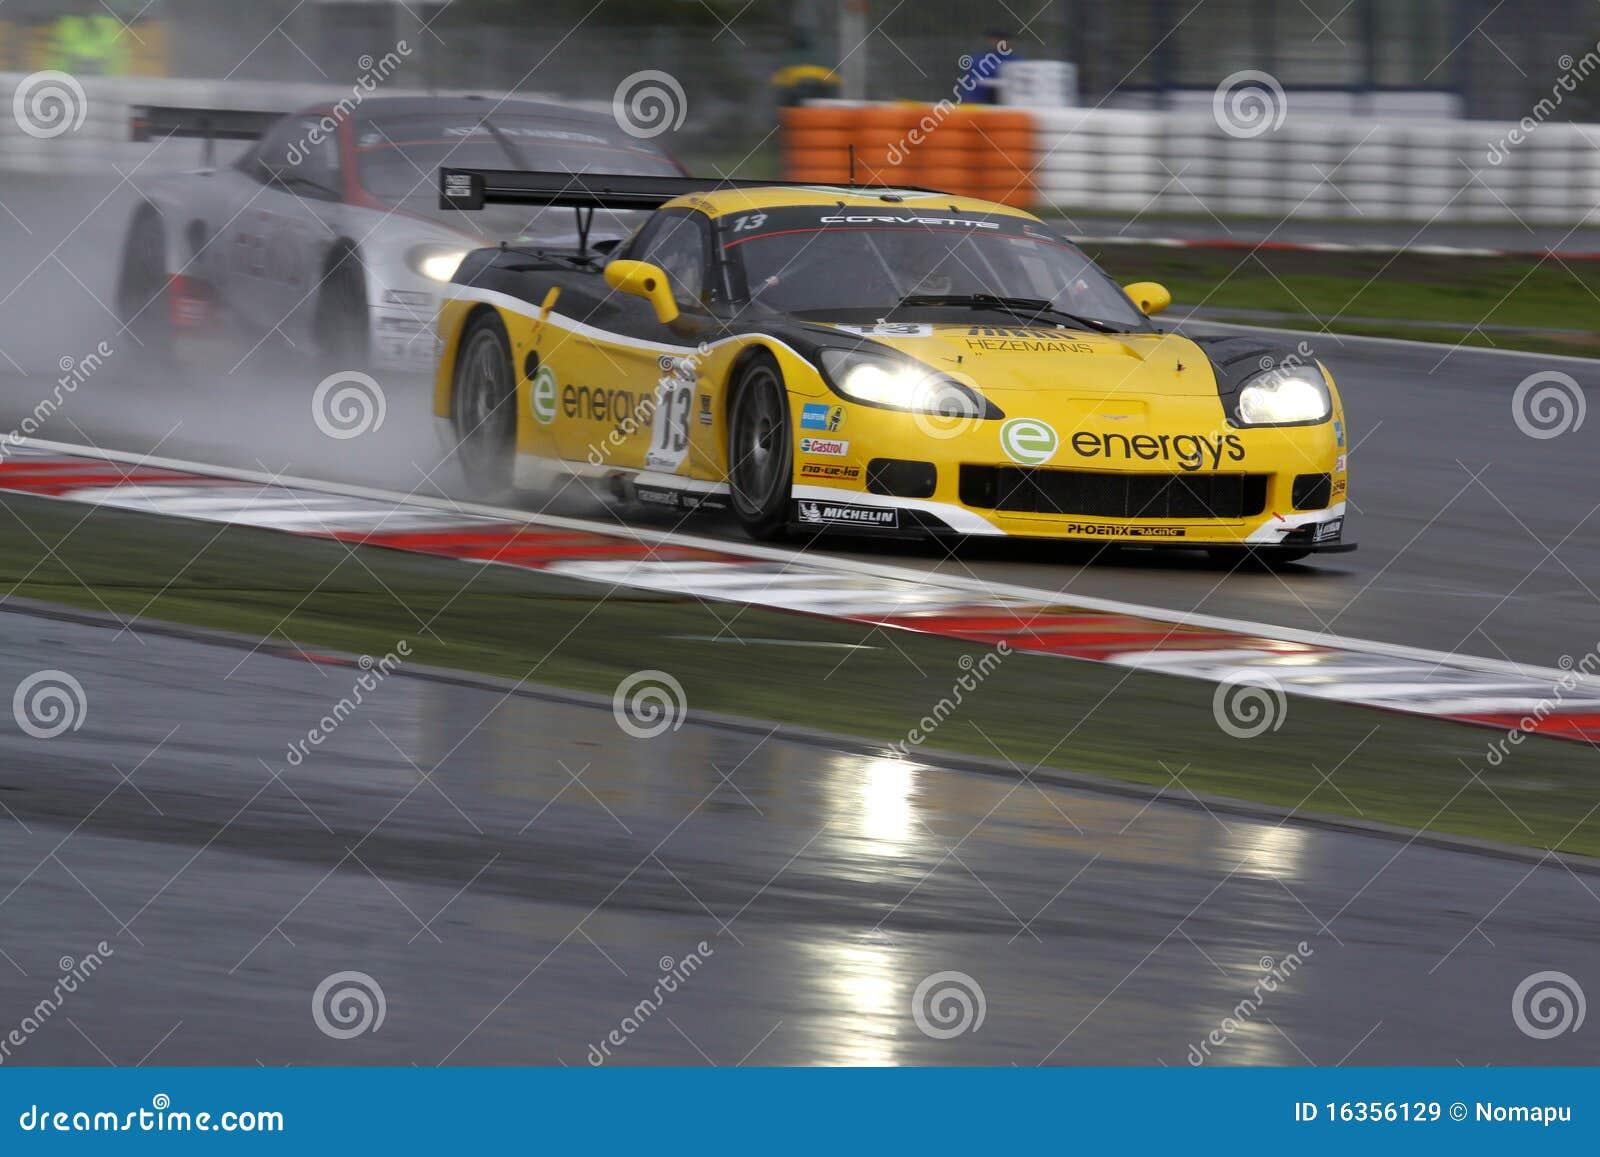 Coche de deportes, Corbeta Z06 (FIA GT)